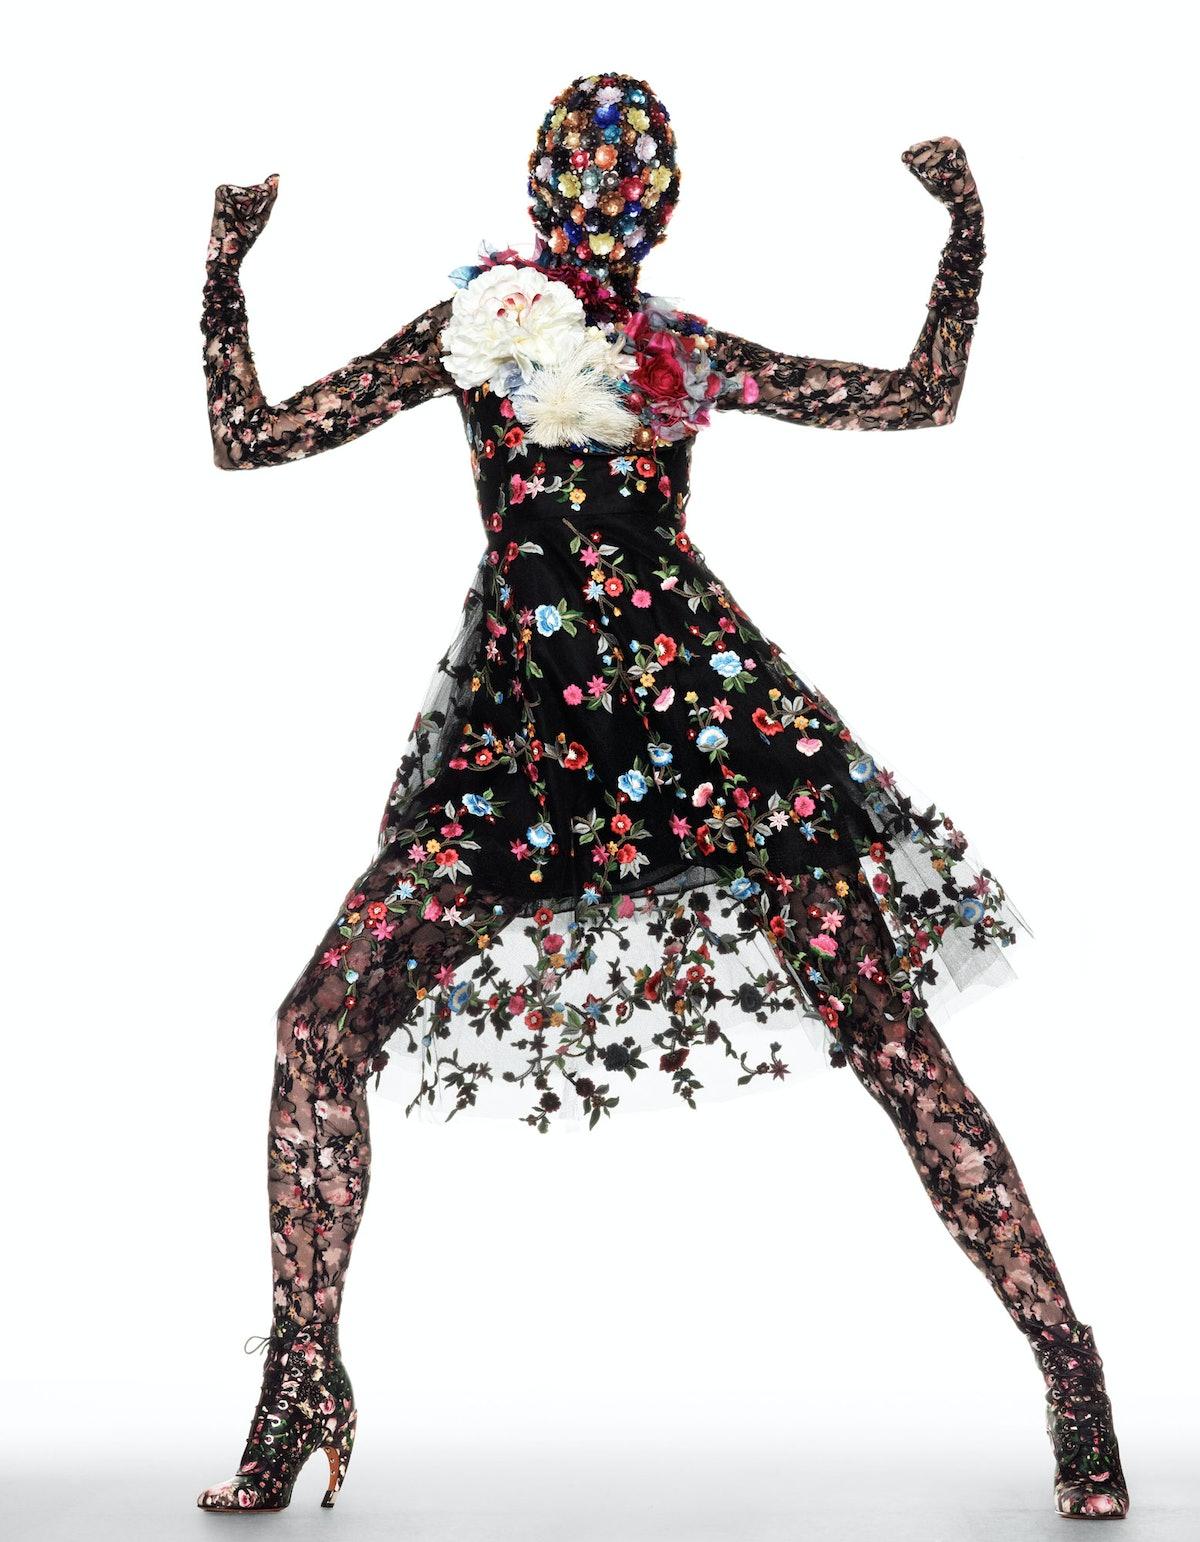 Oscar de la Renta dress; Maison Martin Margiela Artisanal dickey; LaCrasia Gloves gloves; Givenchy b...